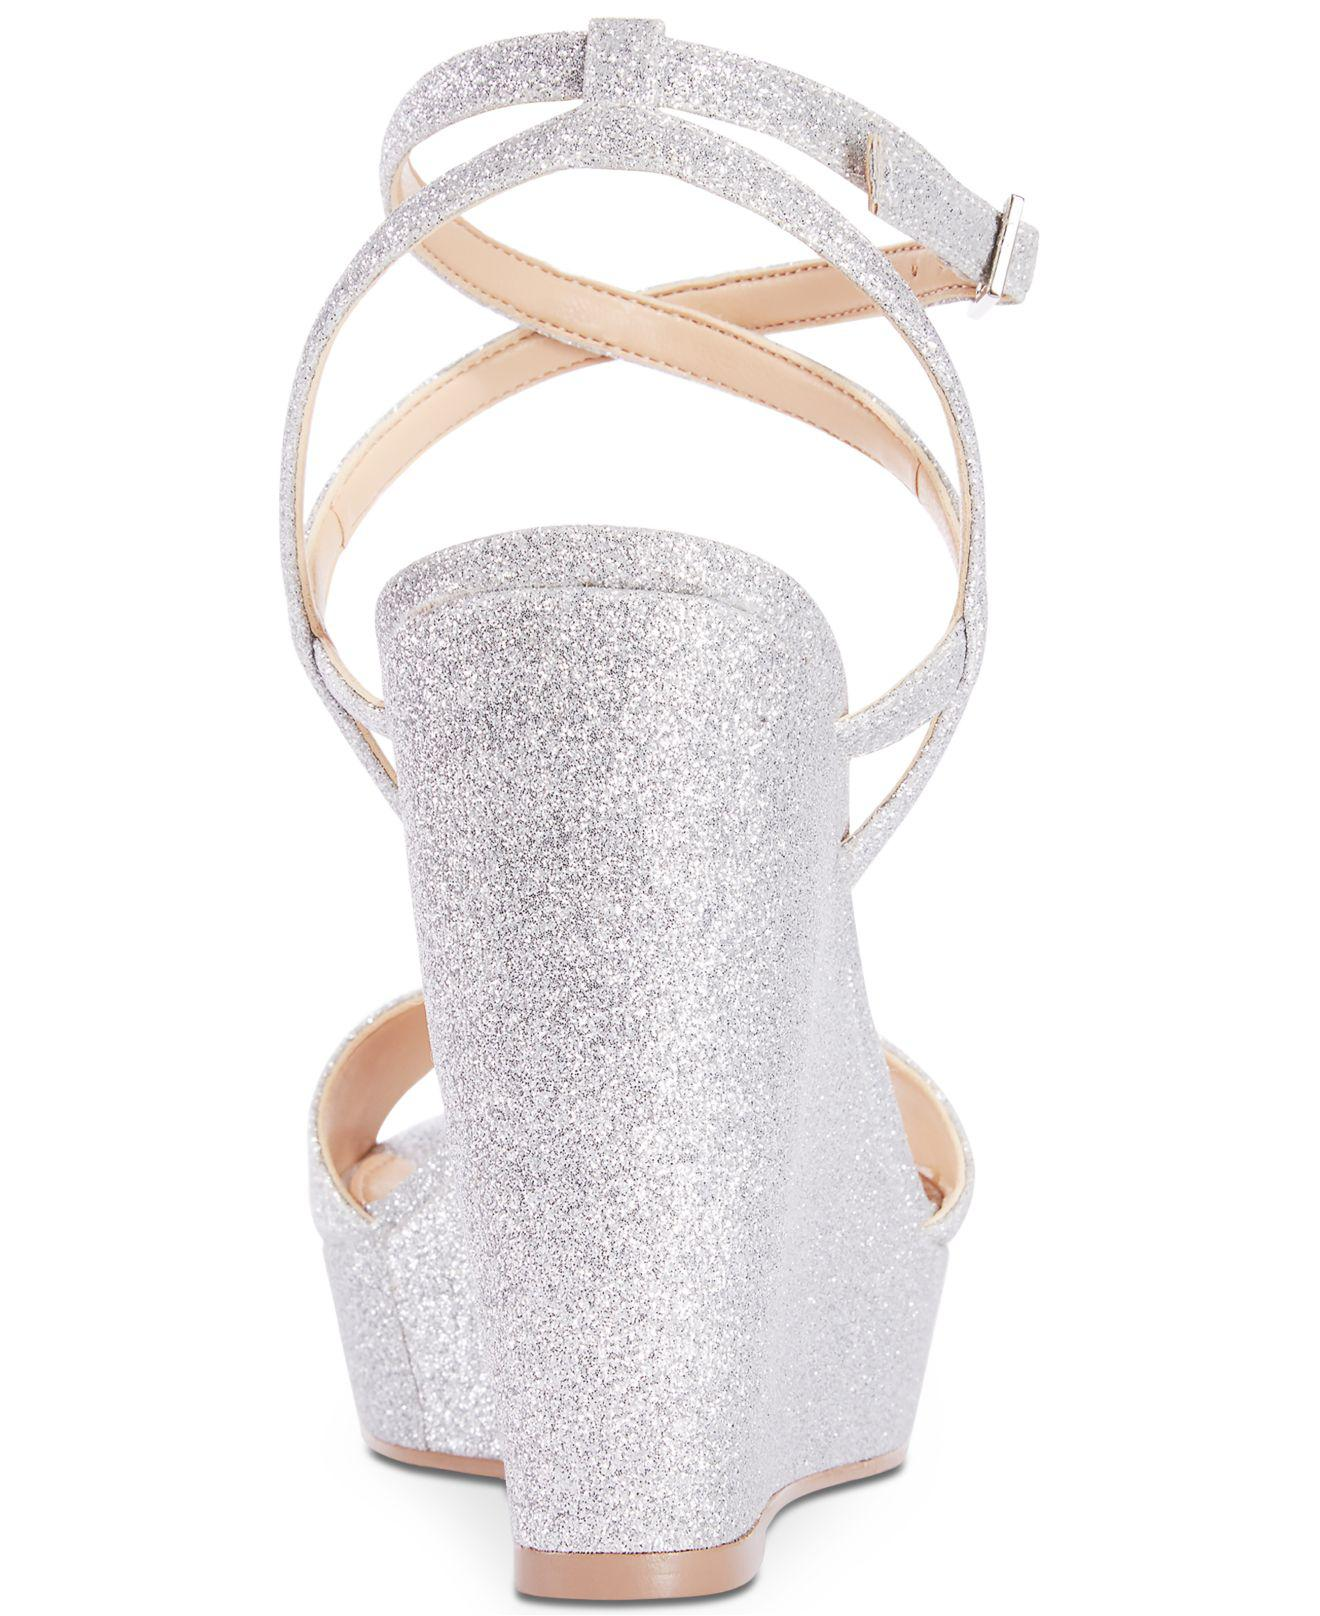 14b2a6cae91 Lyst - Badgley Mischka Ambrosia Glittered Wedge Evening Sandals in ...